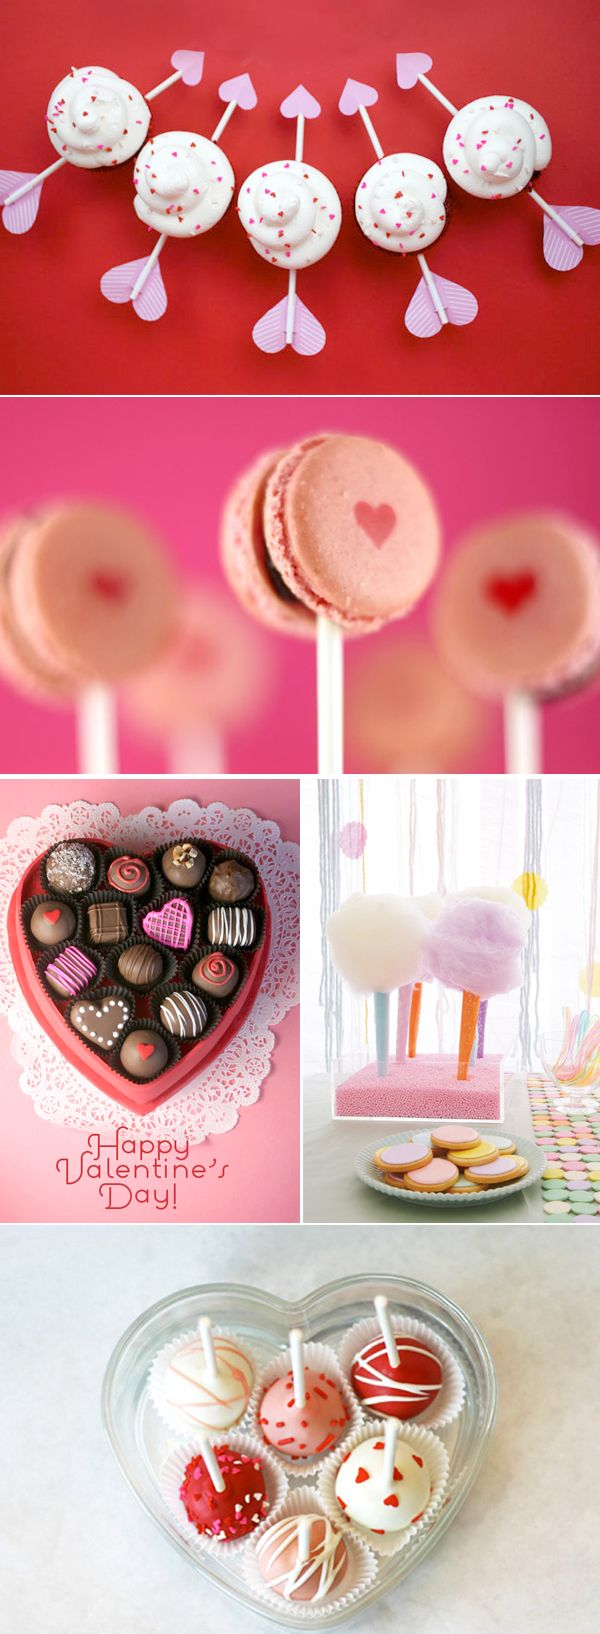 valentine's day desserts chocolate